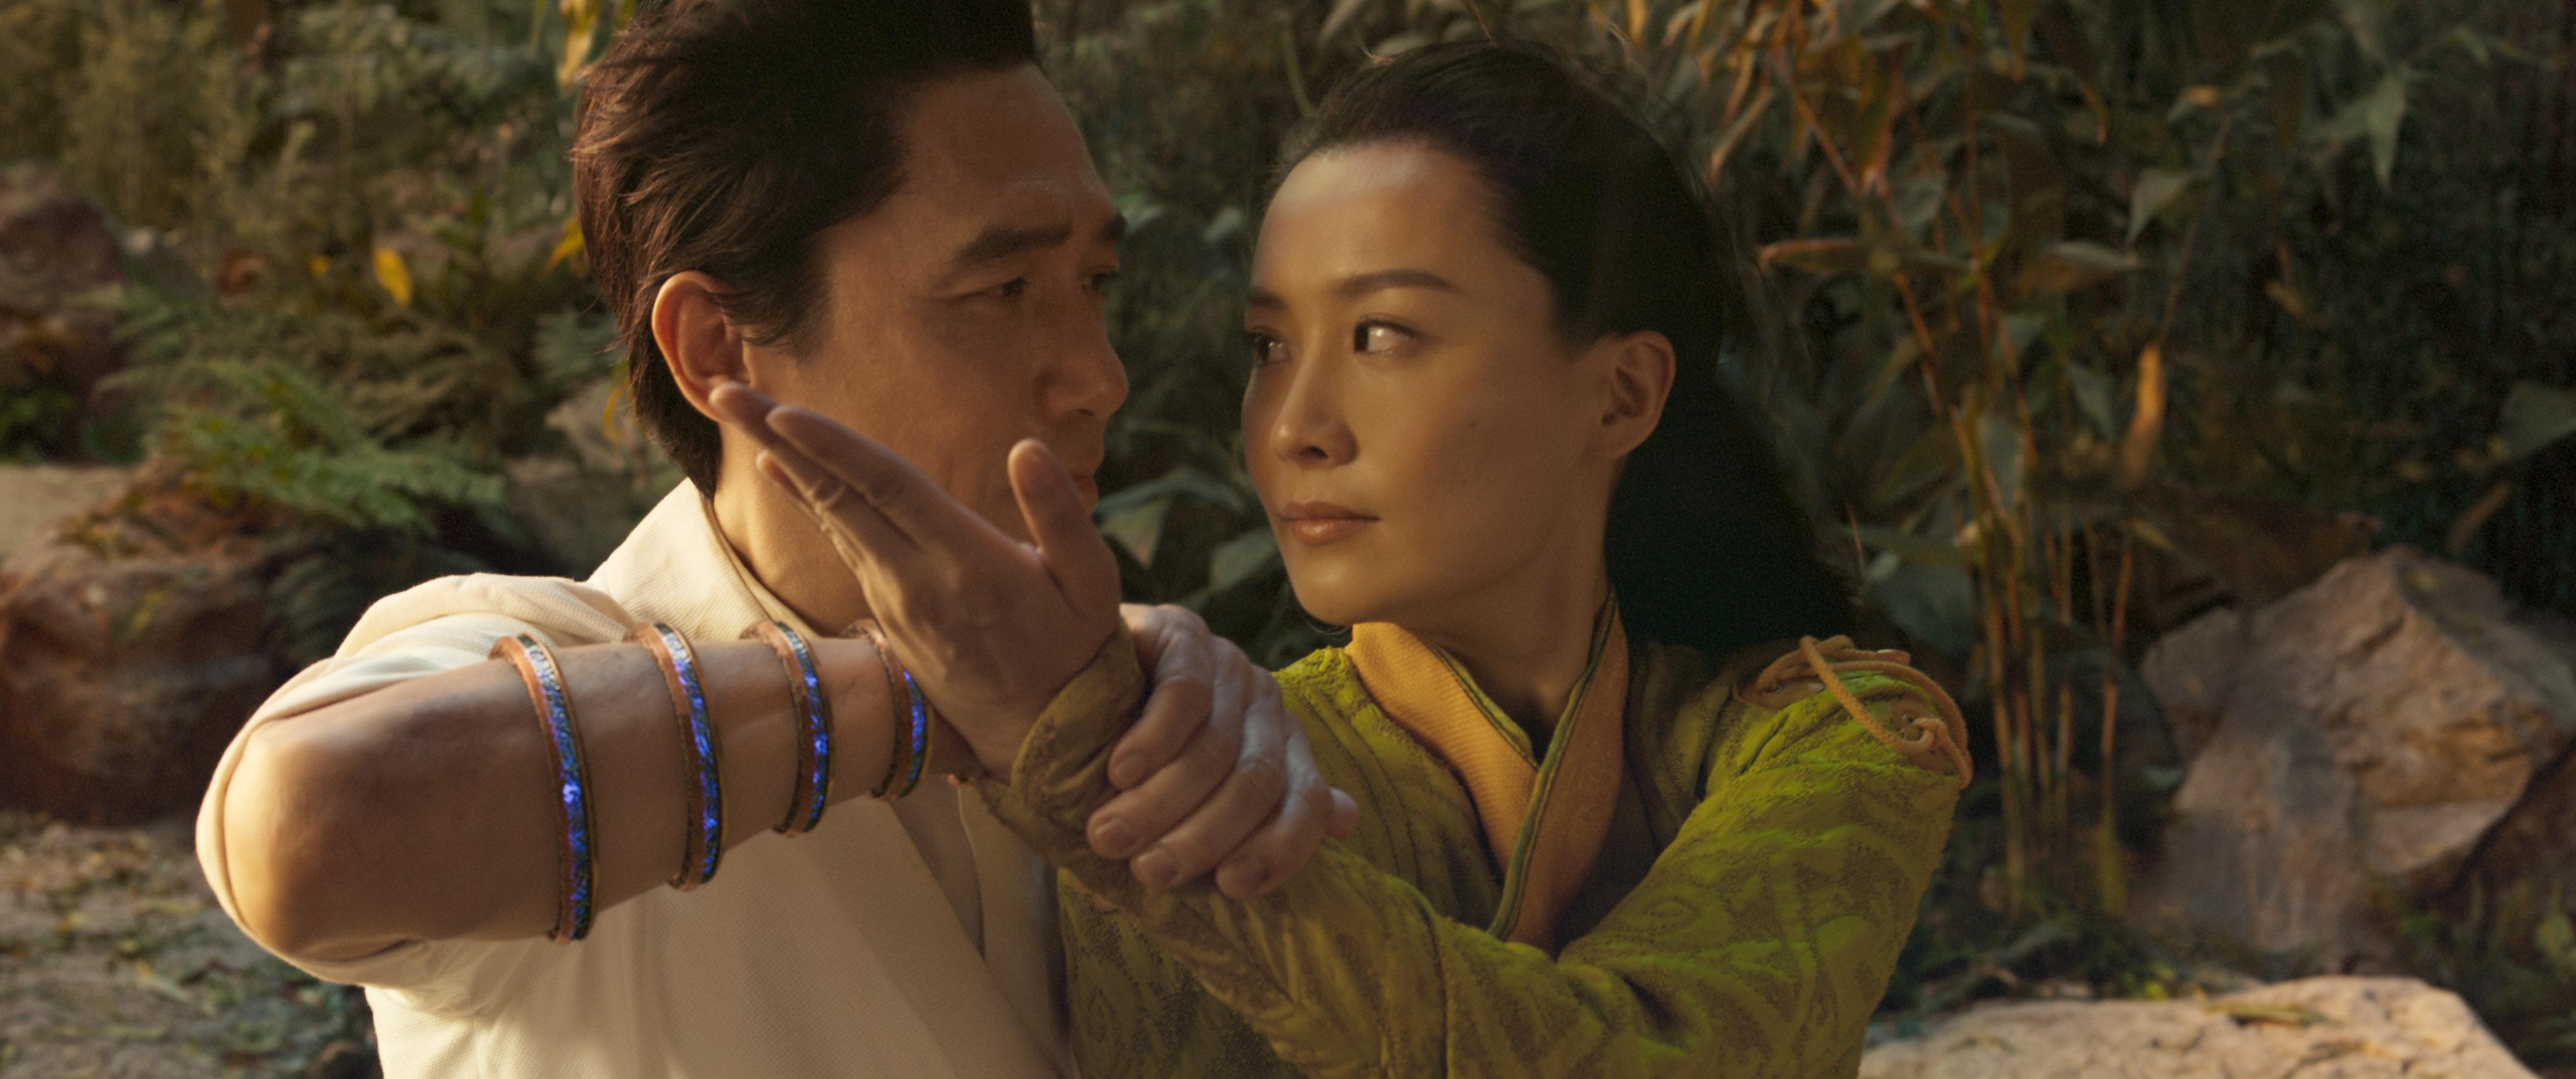 Tony Leung as Wenwu and Fala Chen as Jiang Li in a combative embrace.